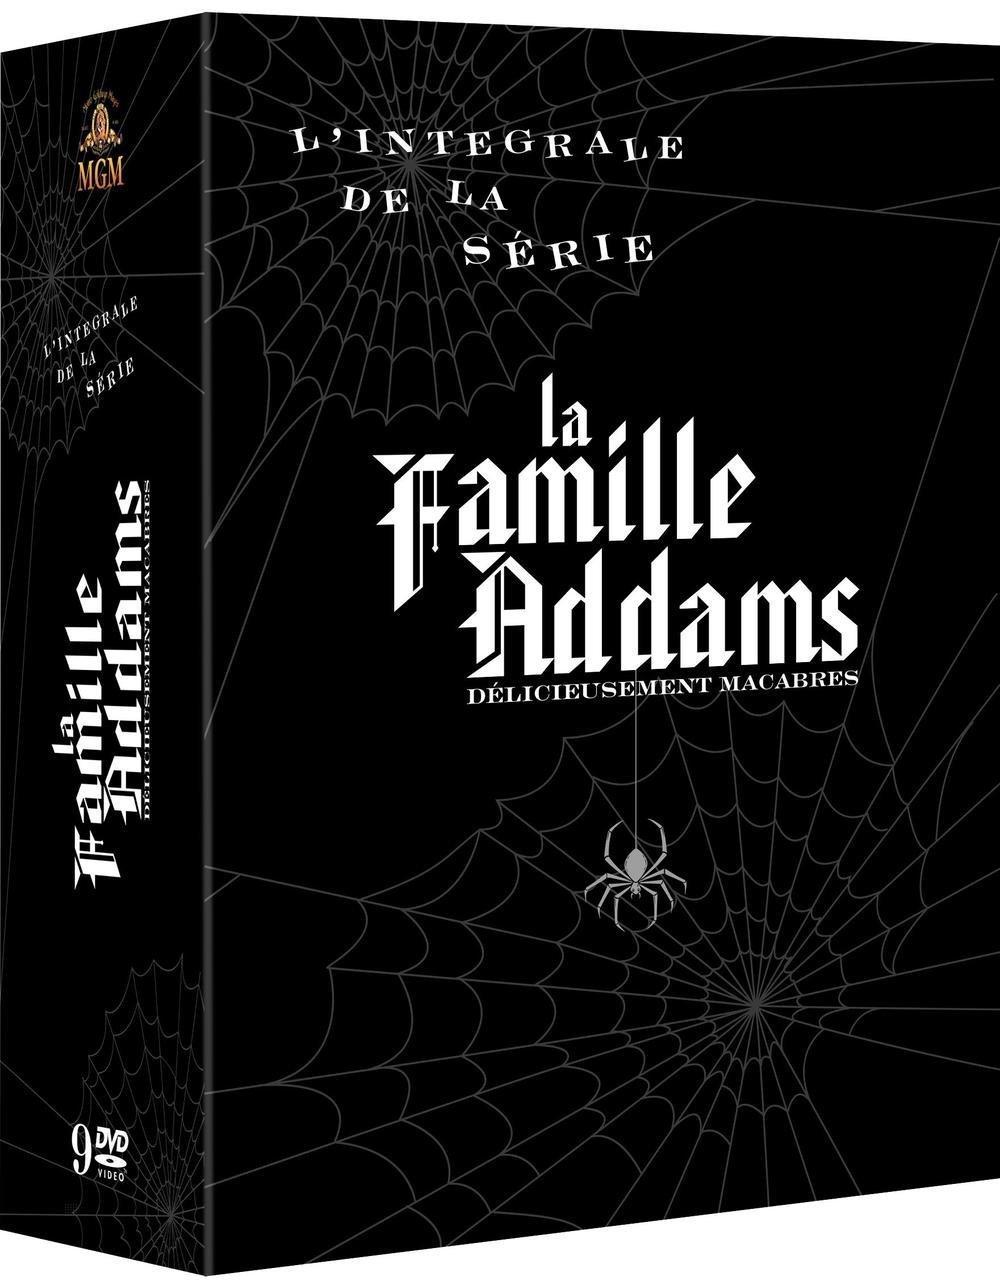 Coffret DVD L'intégrale Famille Addams